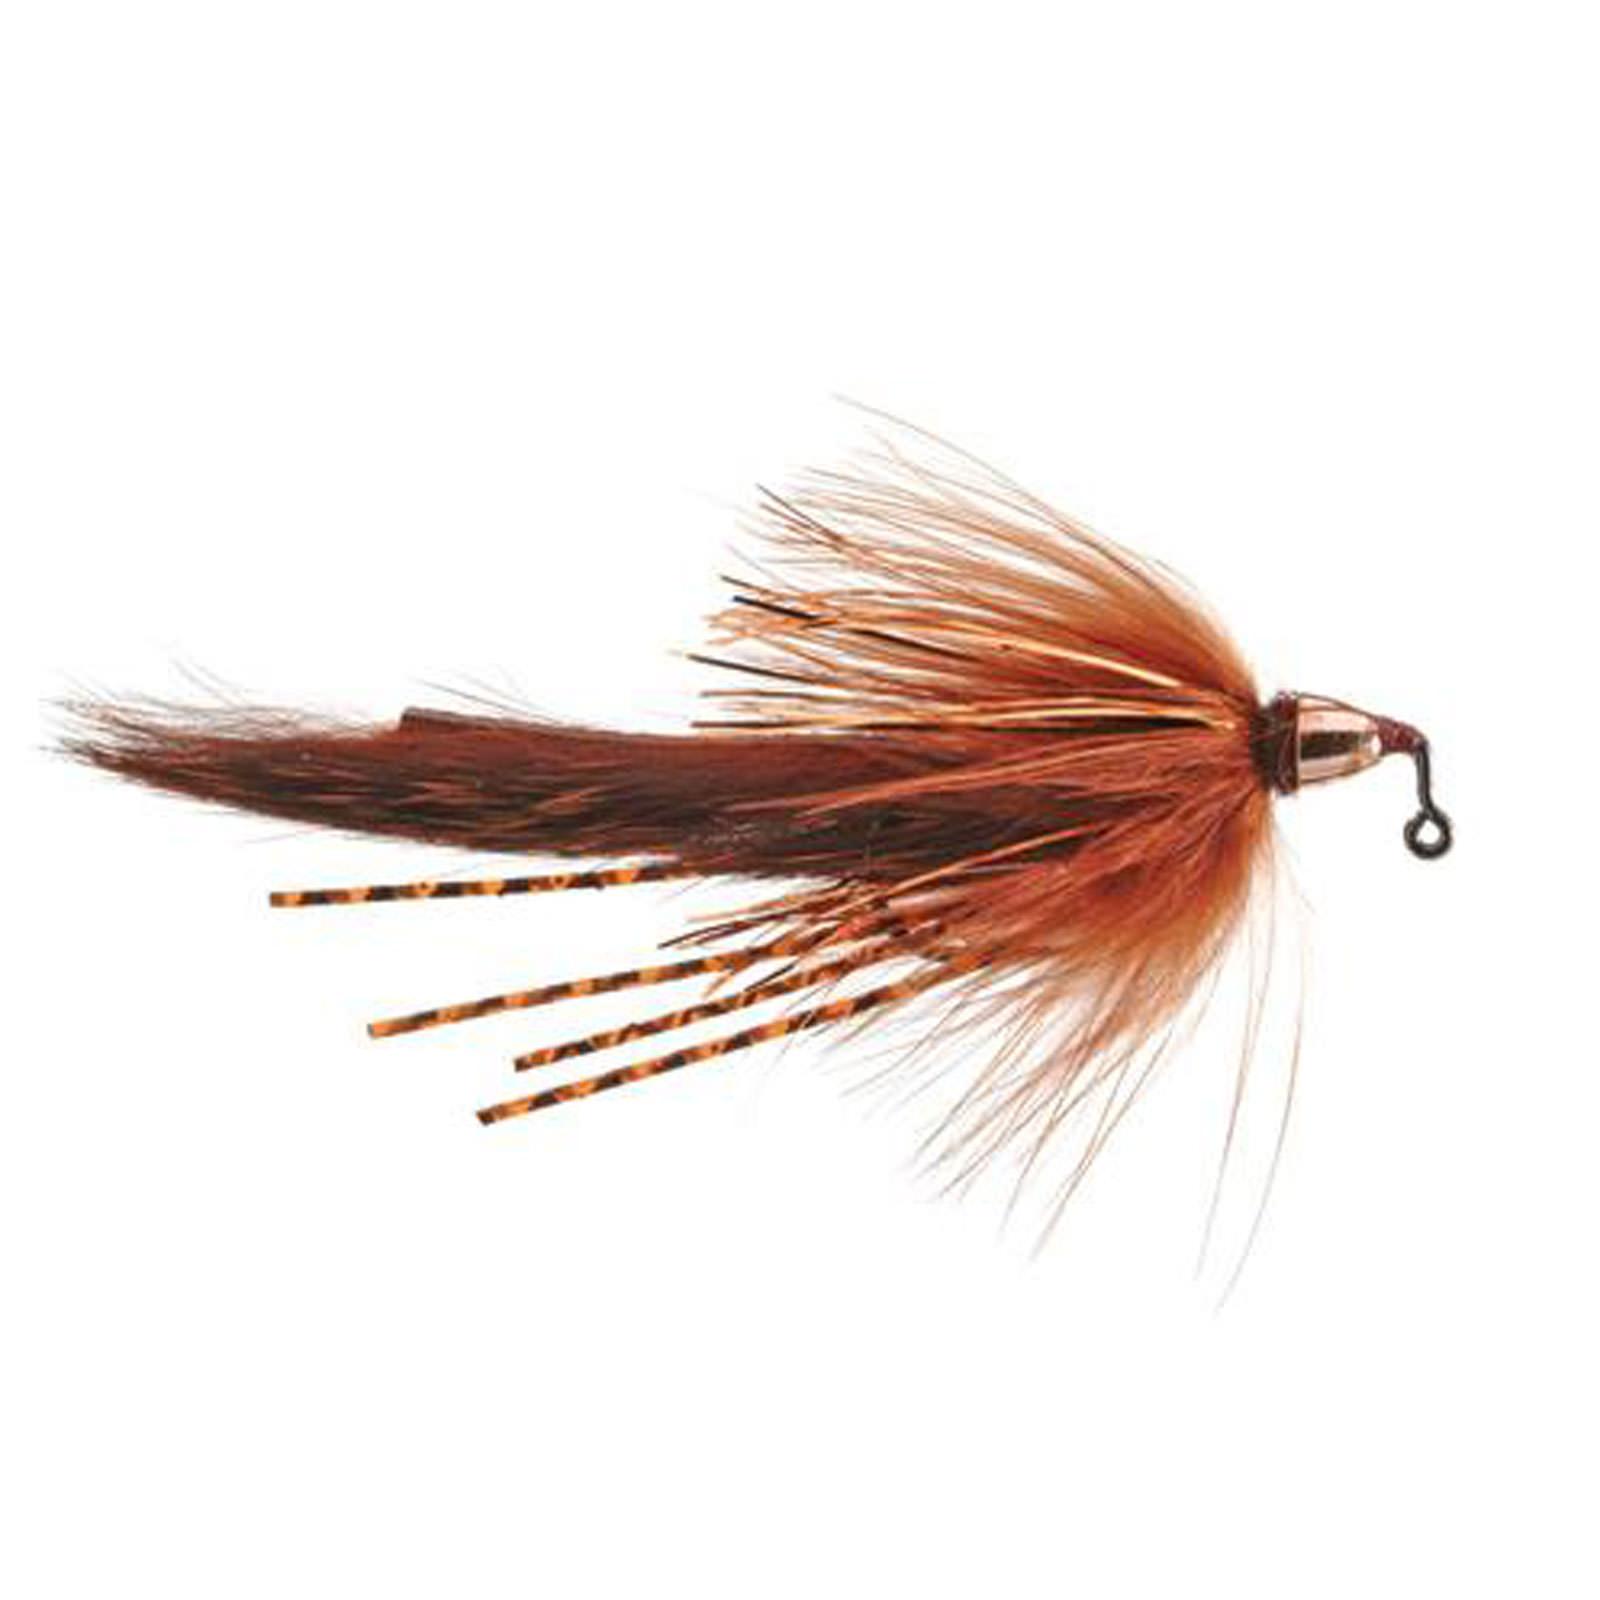 Umpqua Meat Whistle Pattern Streamer Fly Fishing Flies